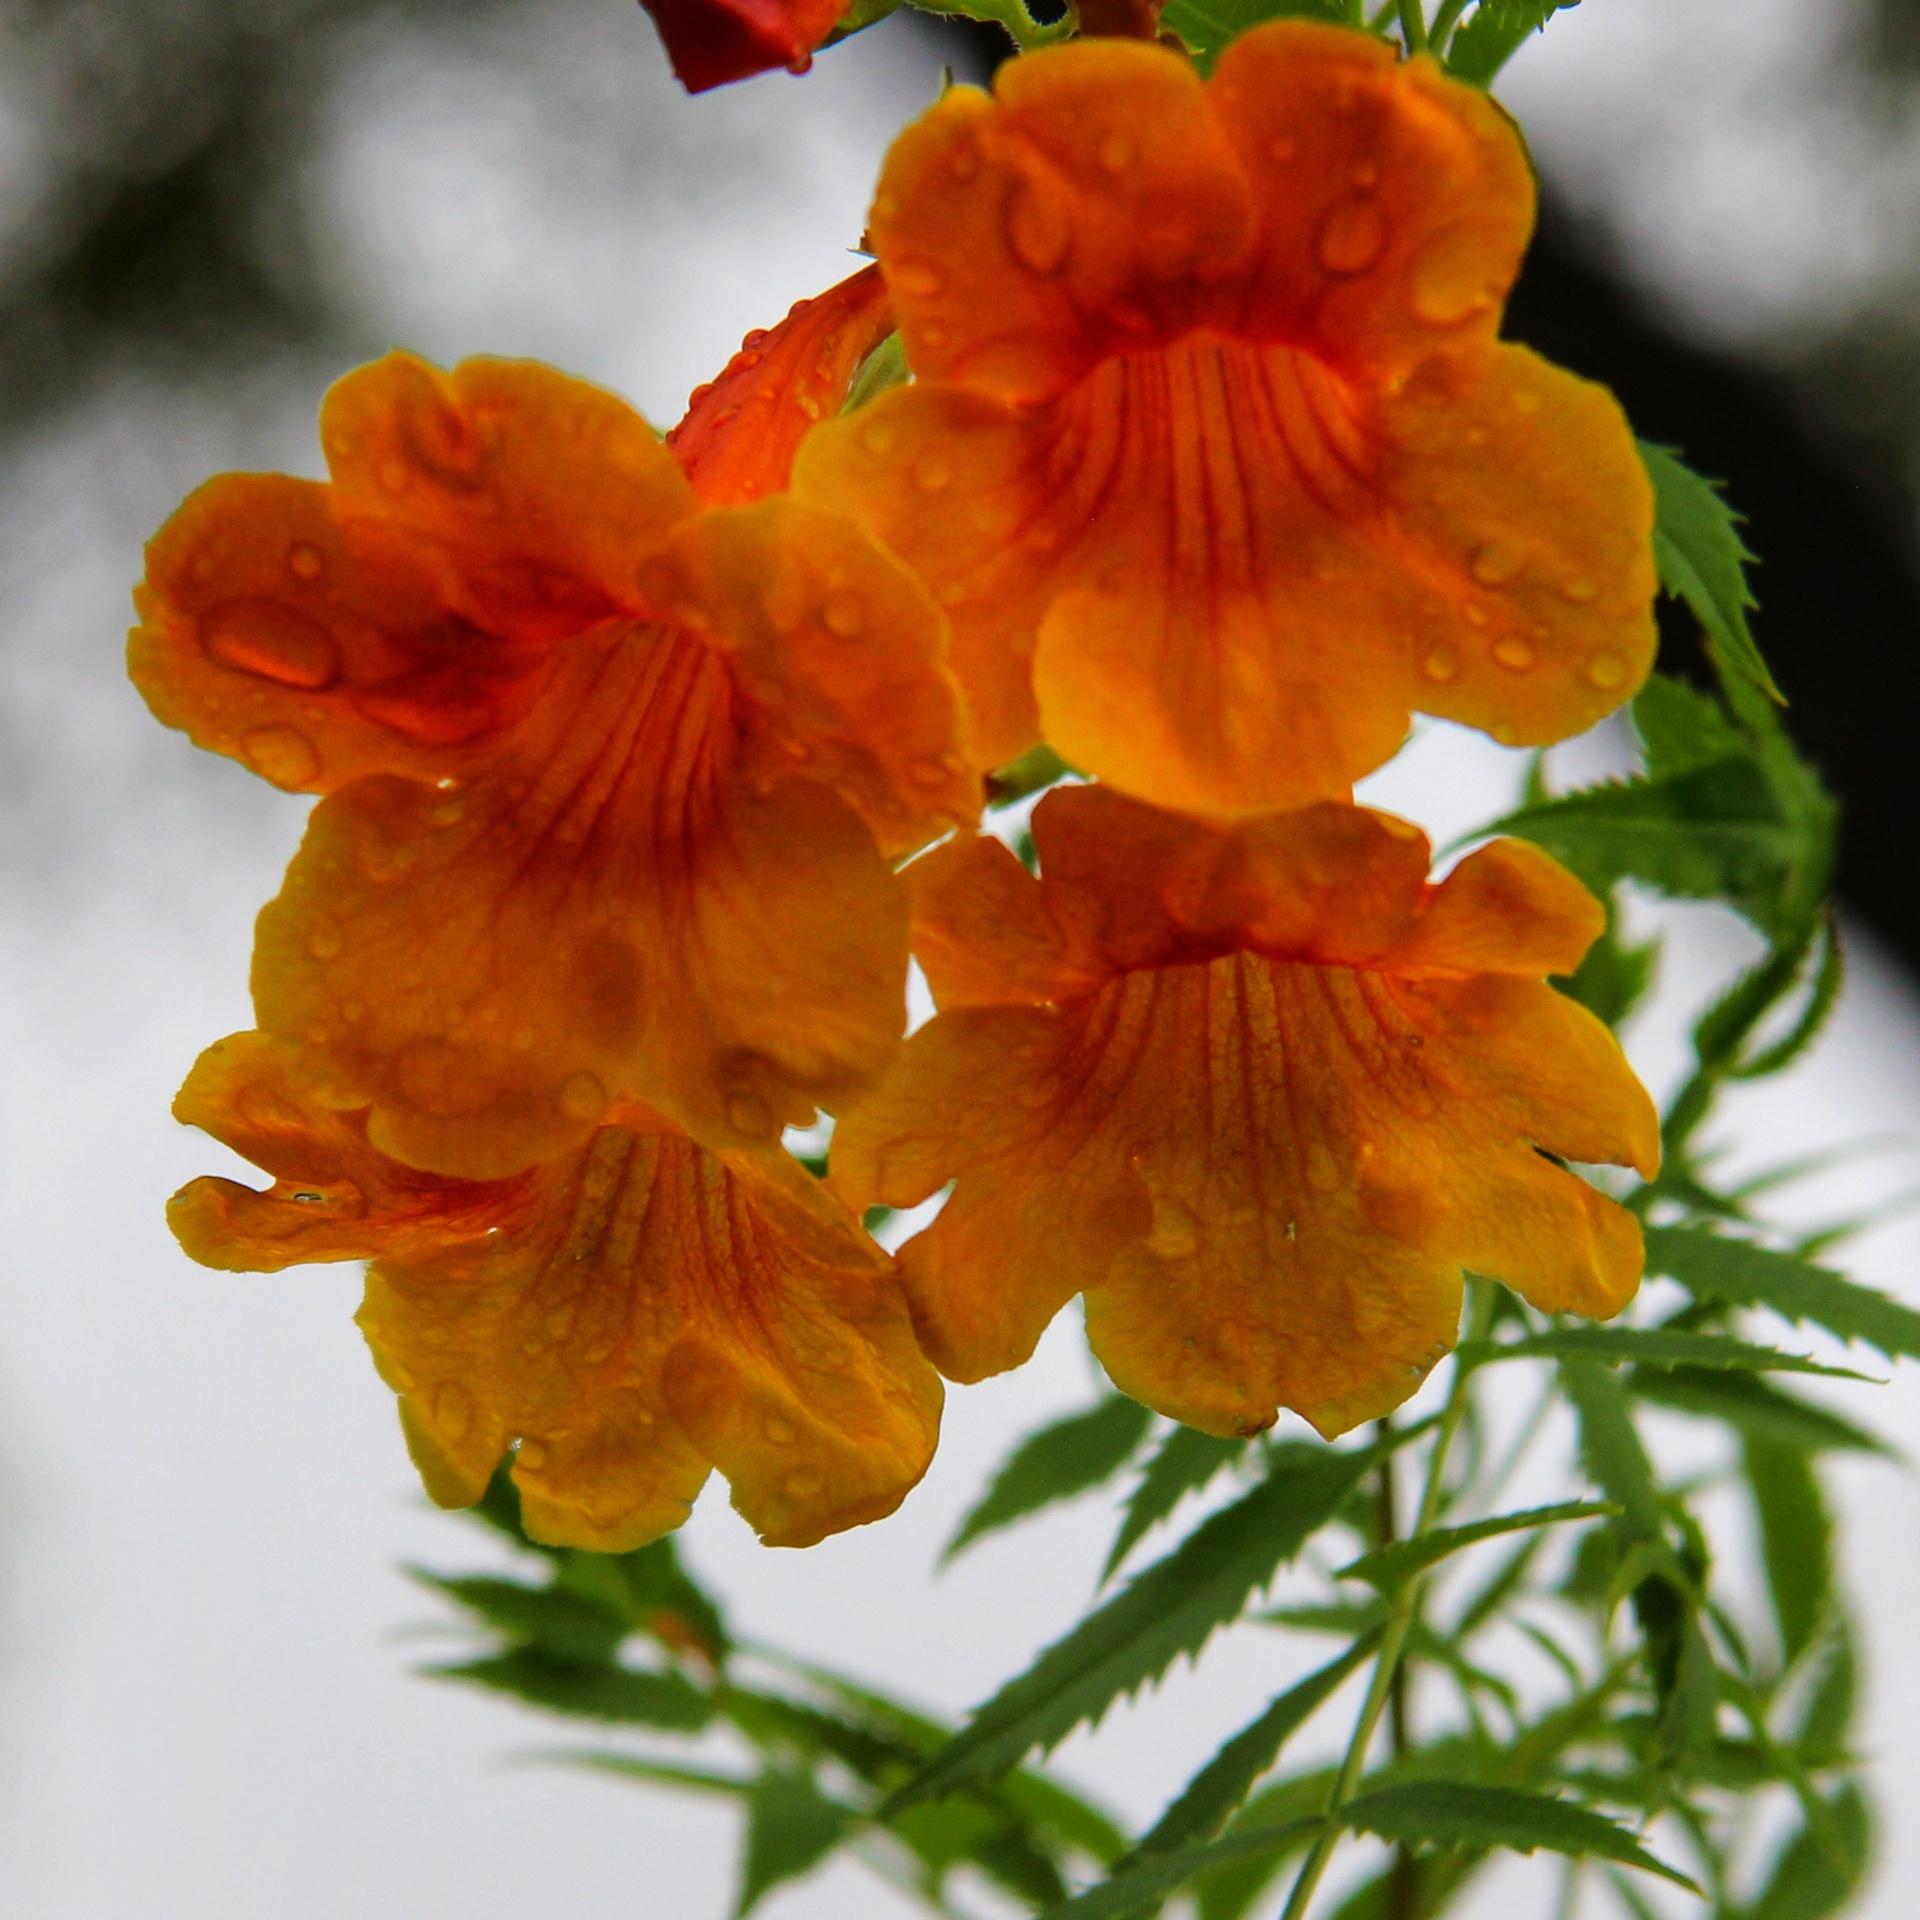 Golden Raindrops by Melissa Onks